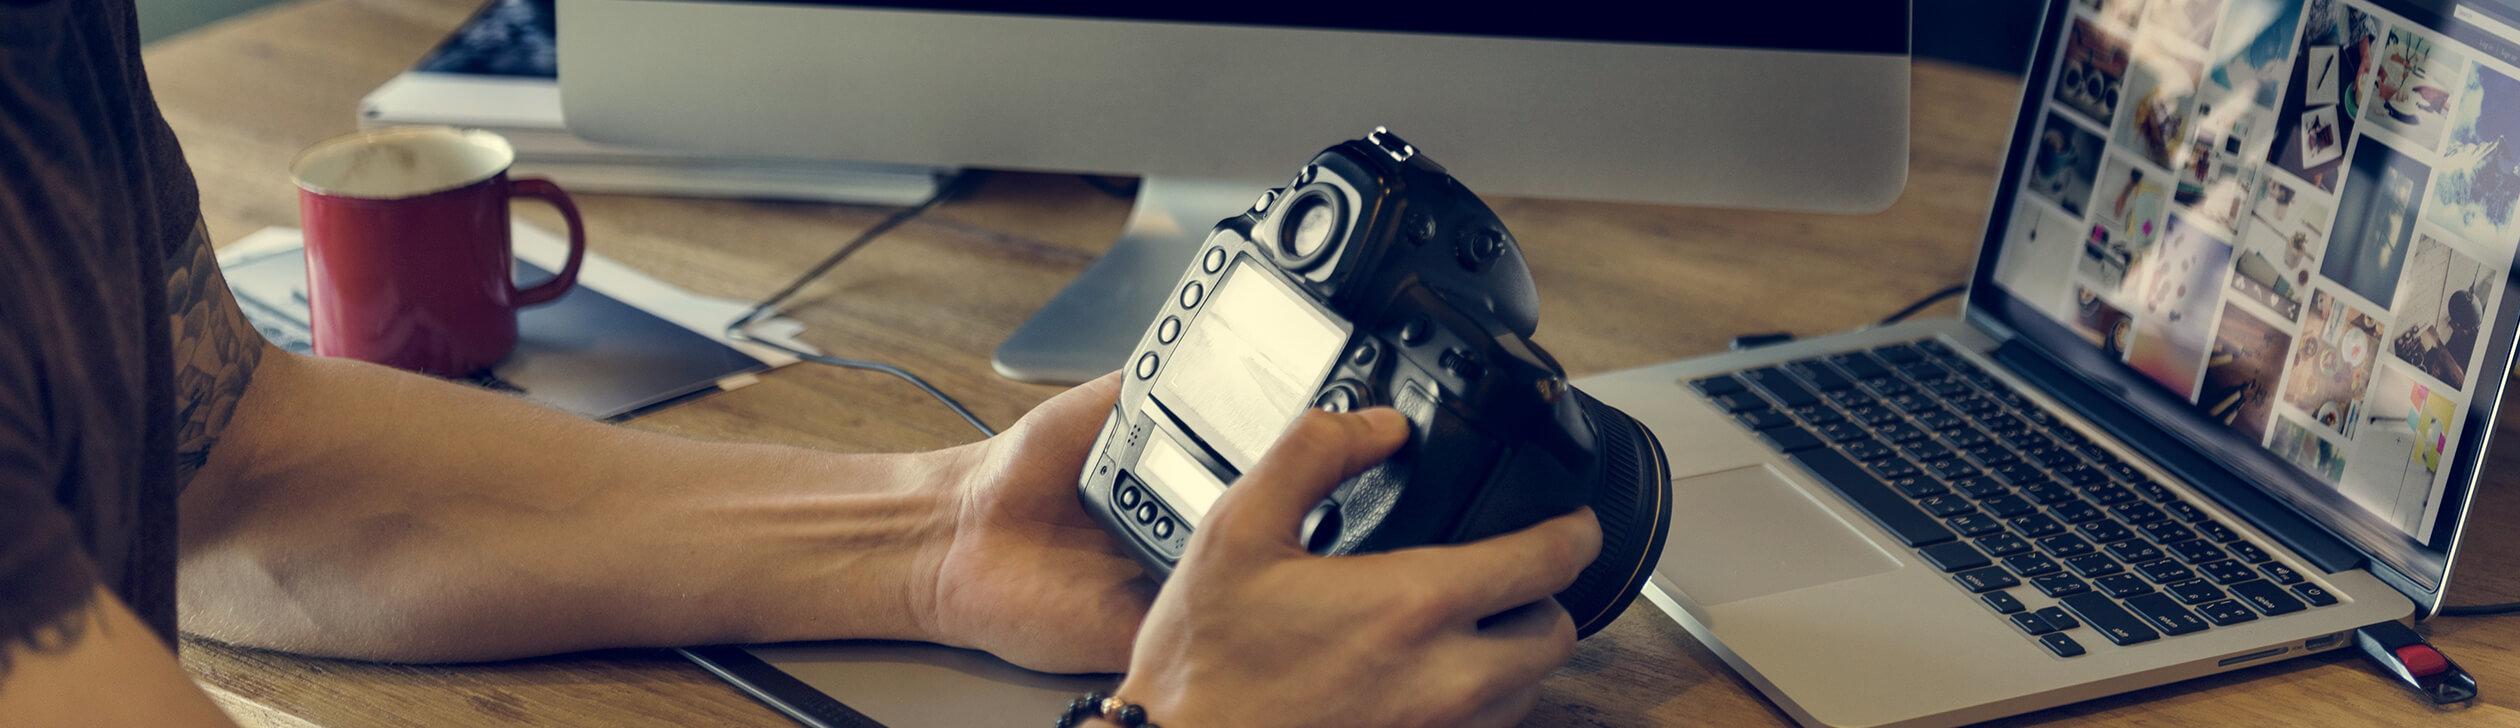 Professional photographer checking recent photos